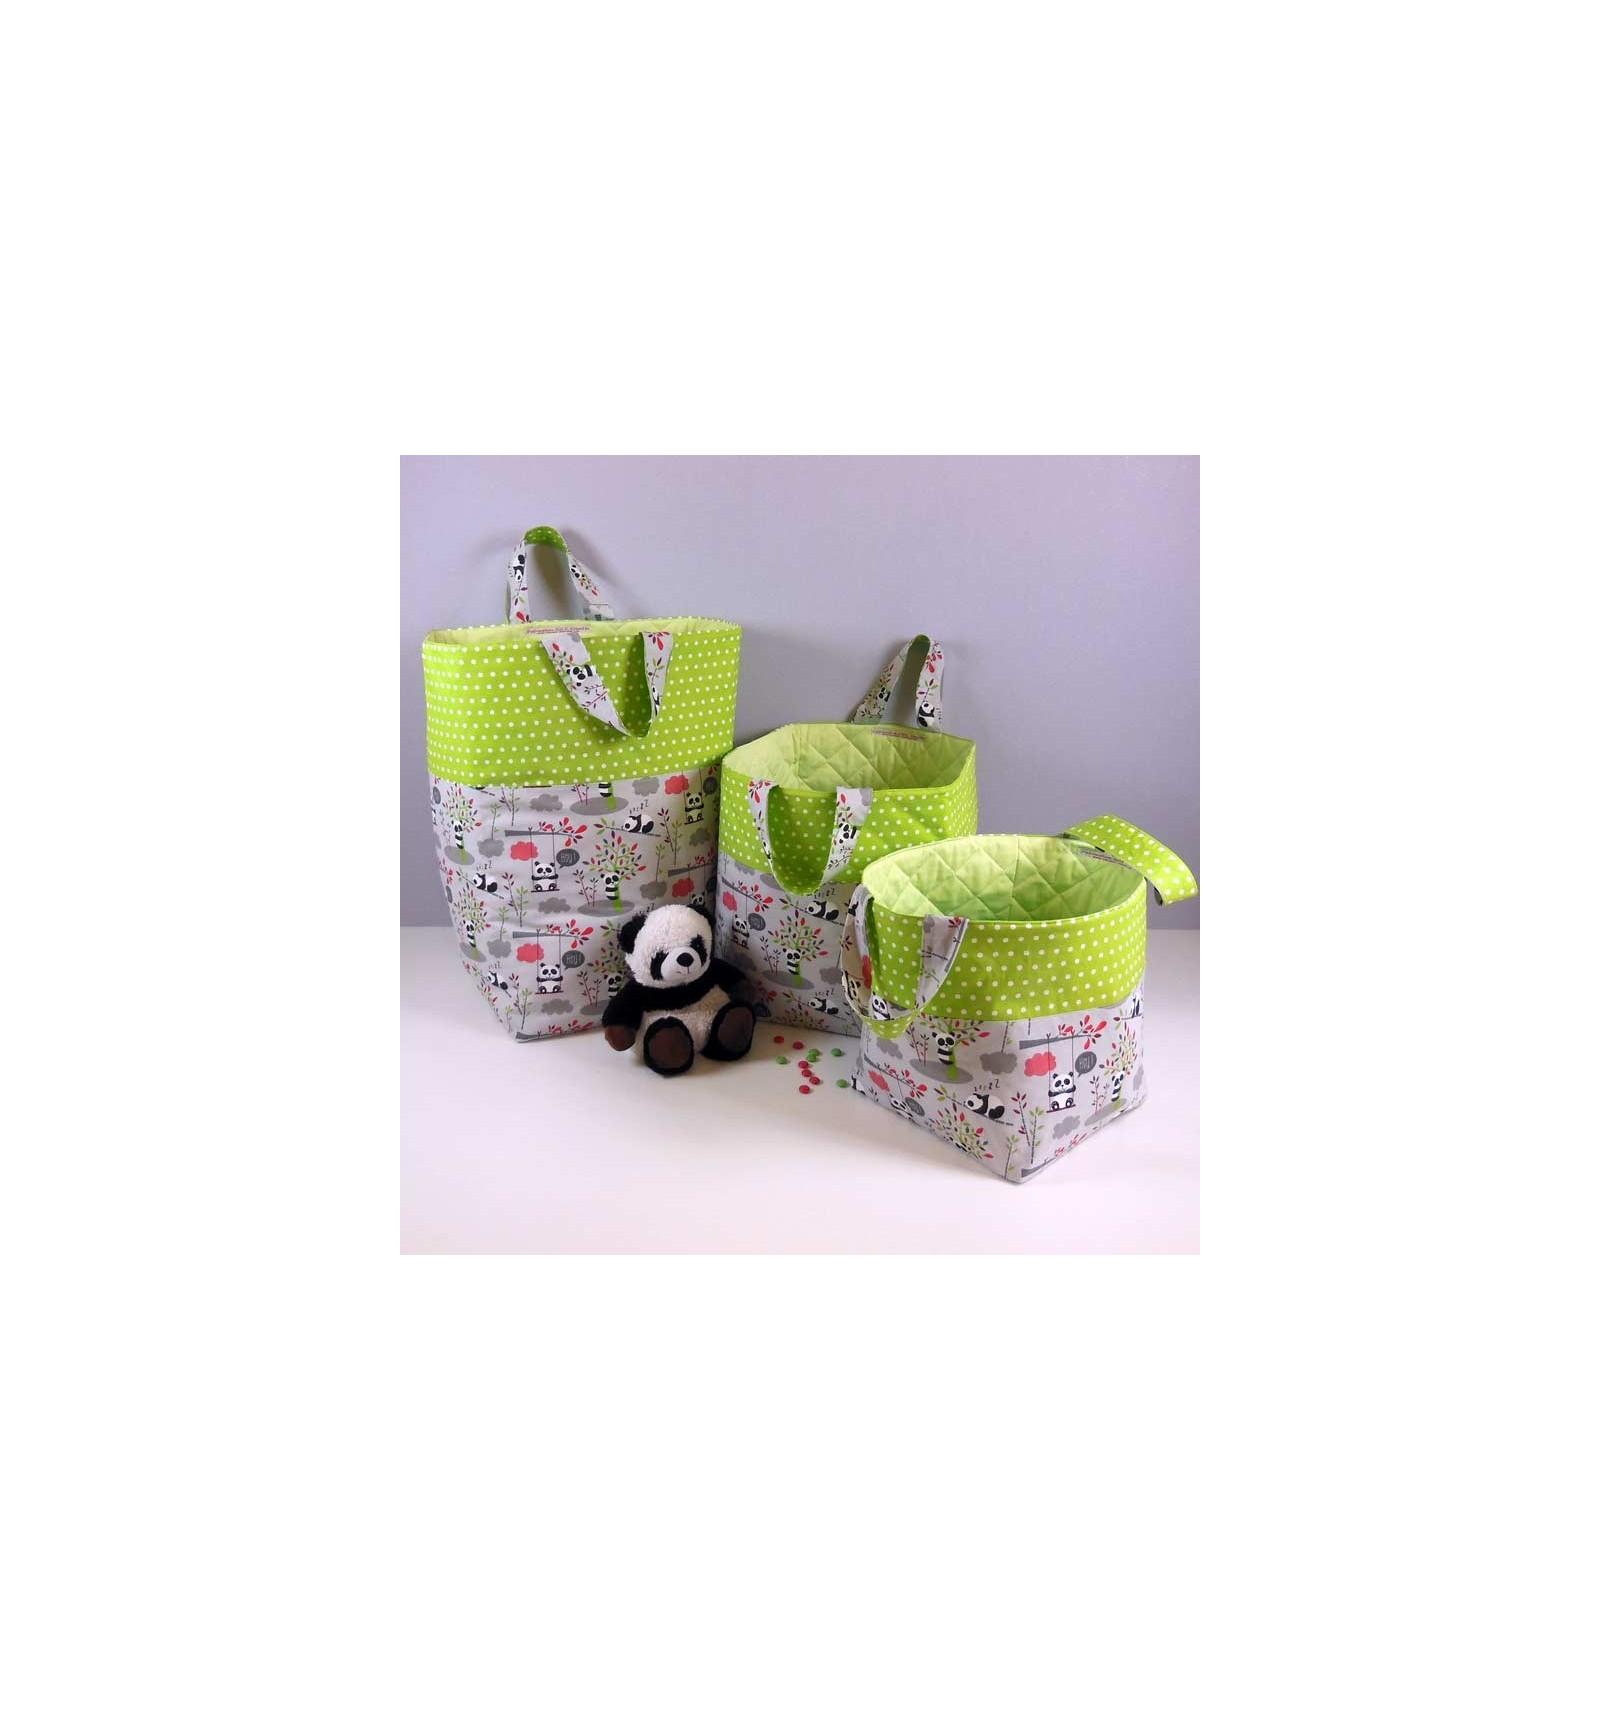 sac rangement chambre enfant motifs panda cr aflo. Black Bedroom Furniture Sets. Home Design Ideas